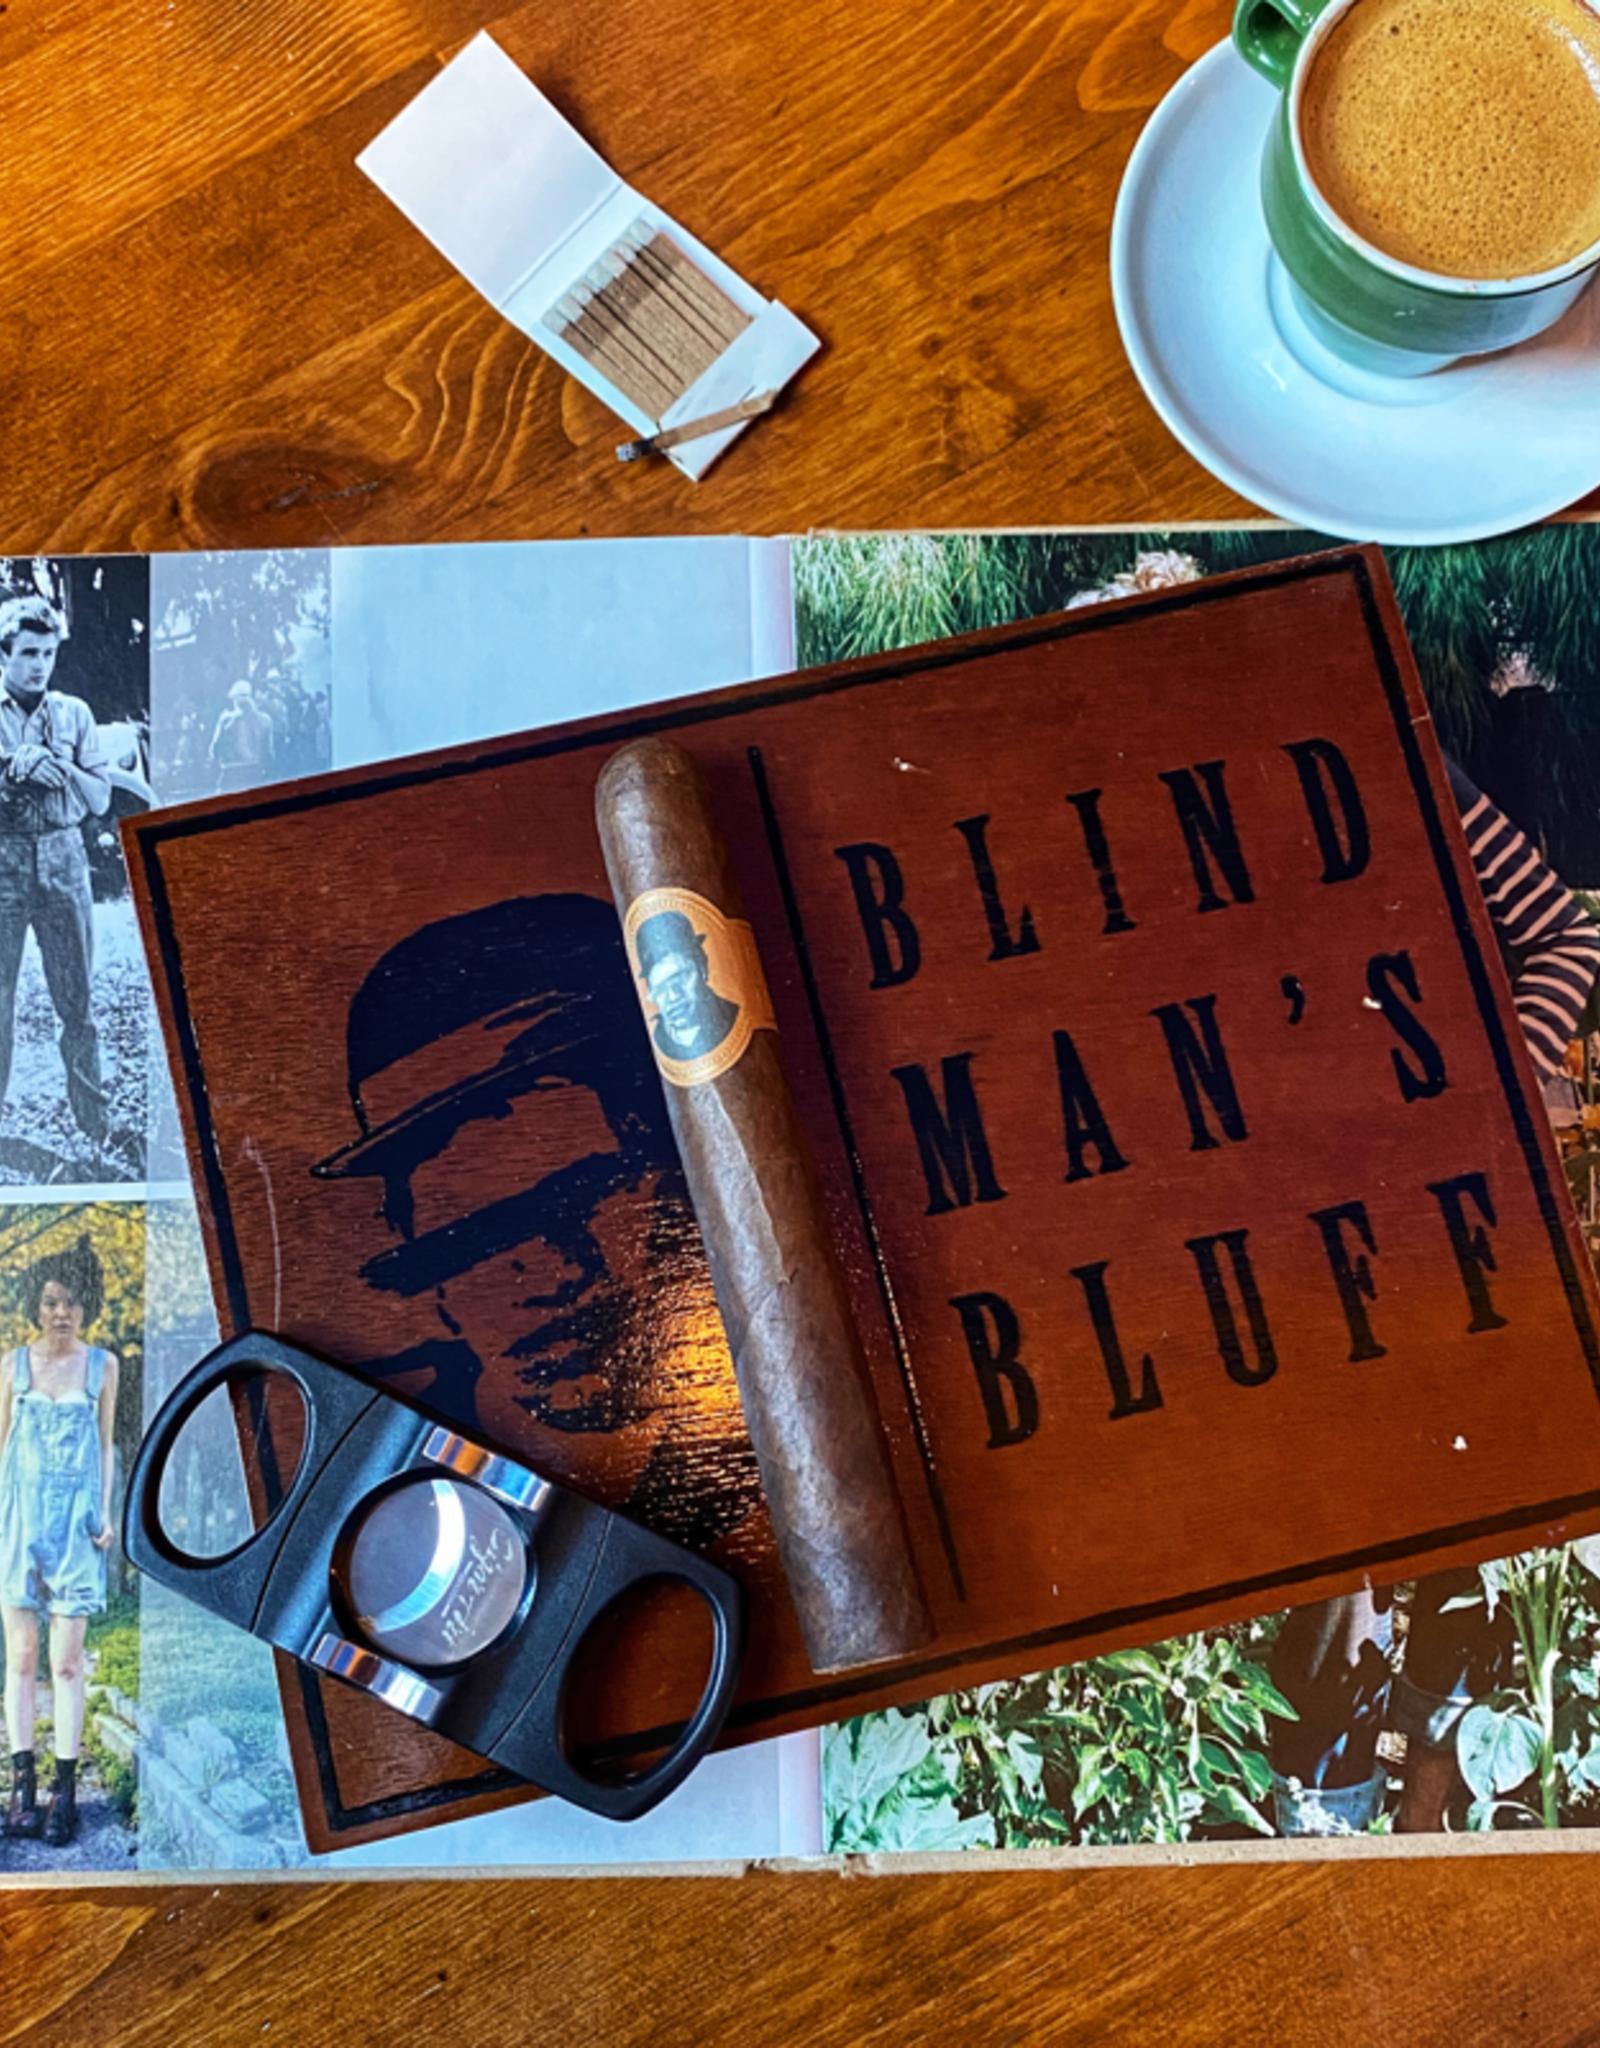 Caldwell Cigar Co Blind Man's Bluff Habano Robusto 5 x 50